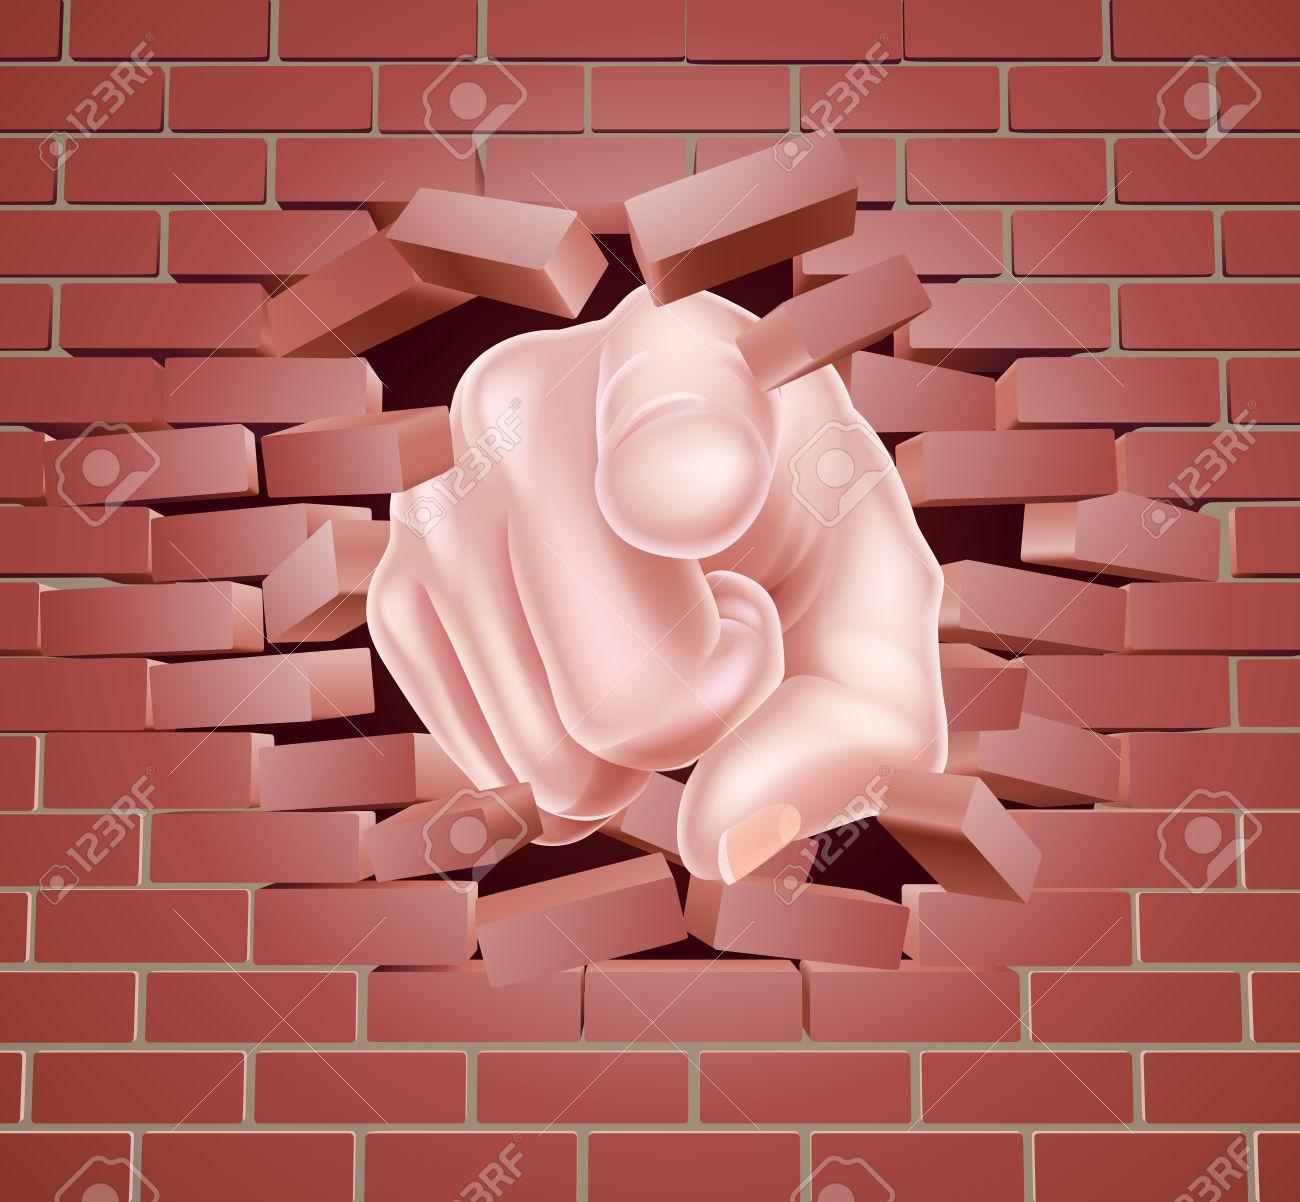 8,782 Broken Wall Stock Vector Illustration And Royalty Free.